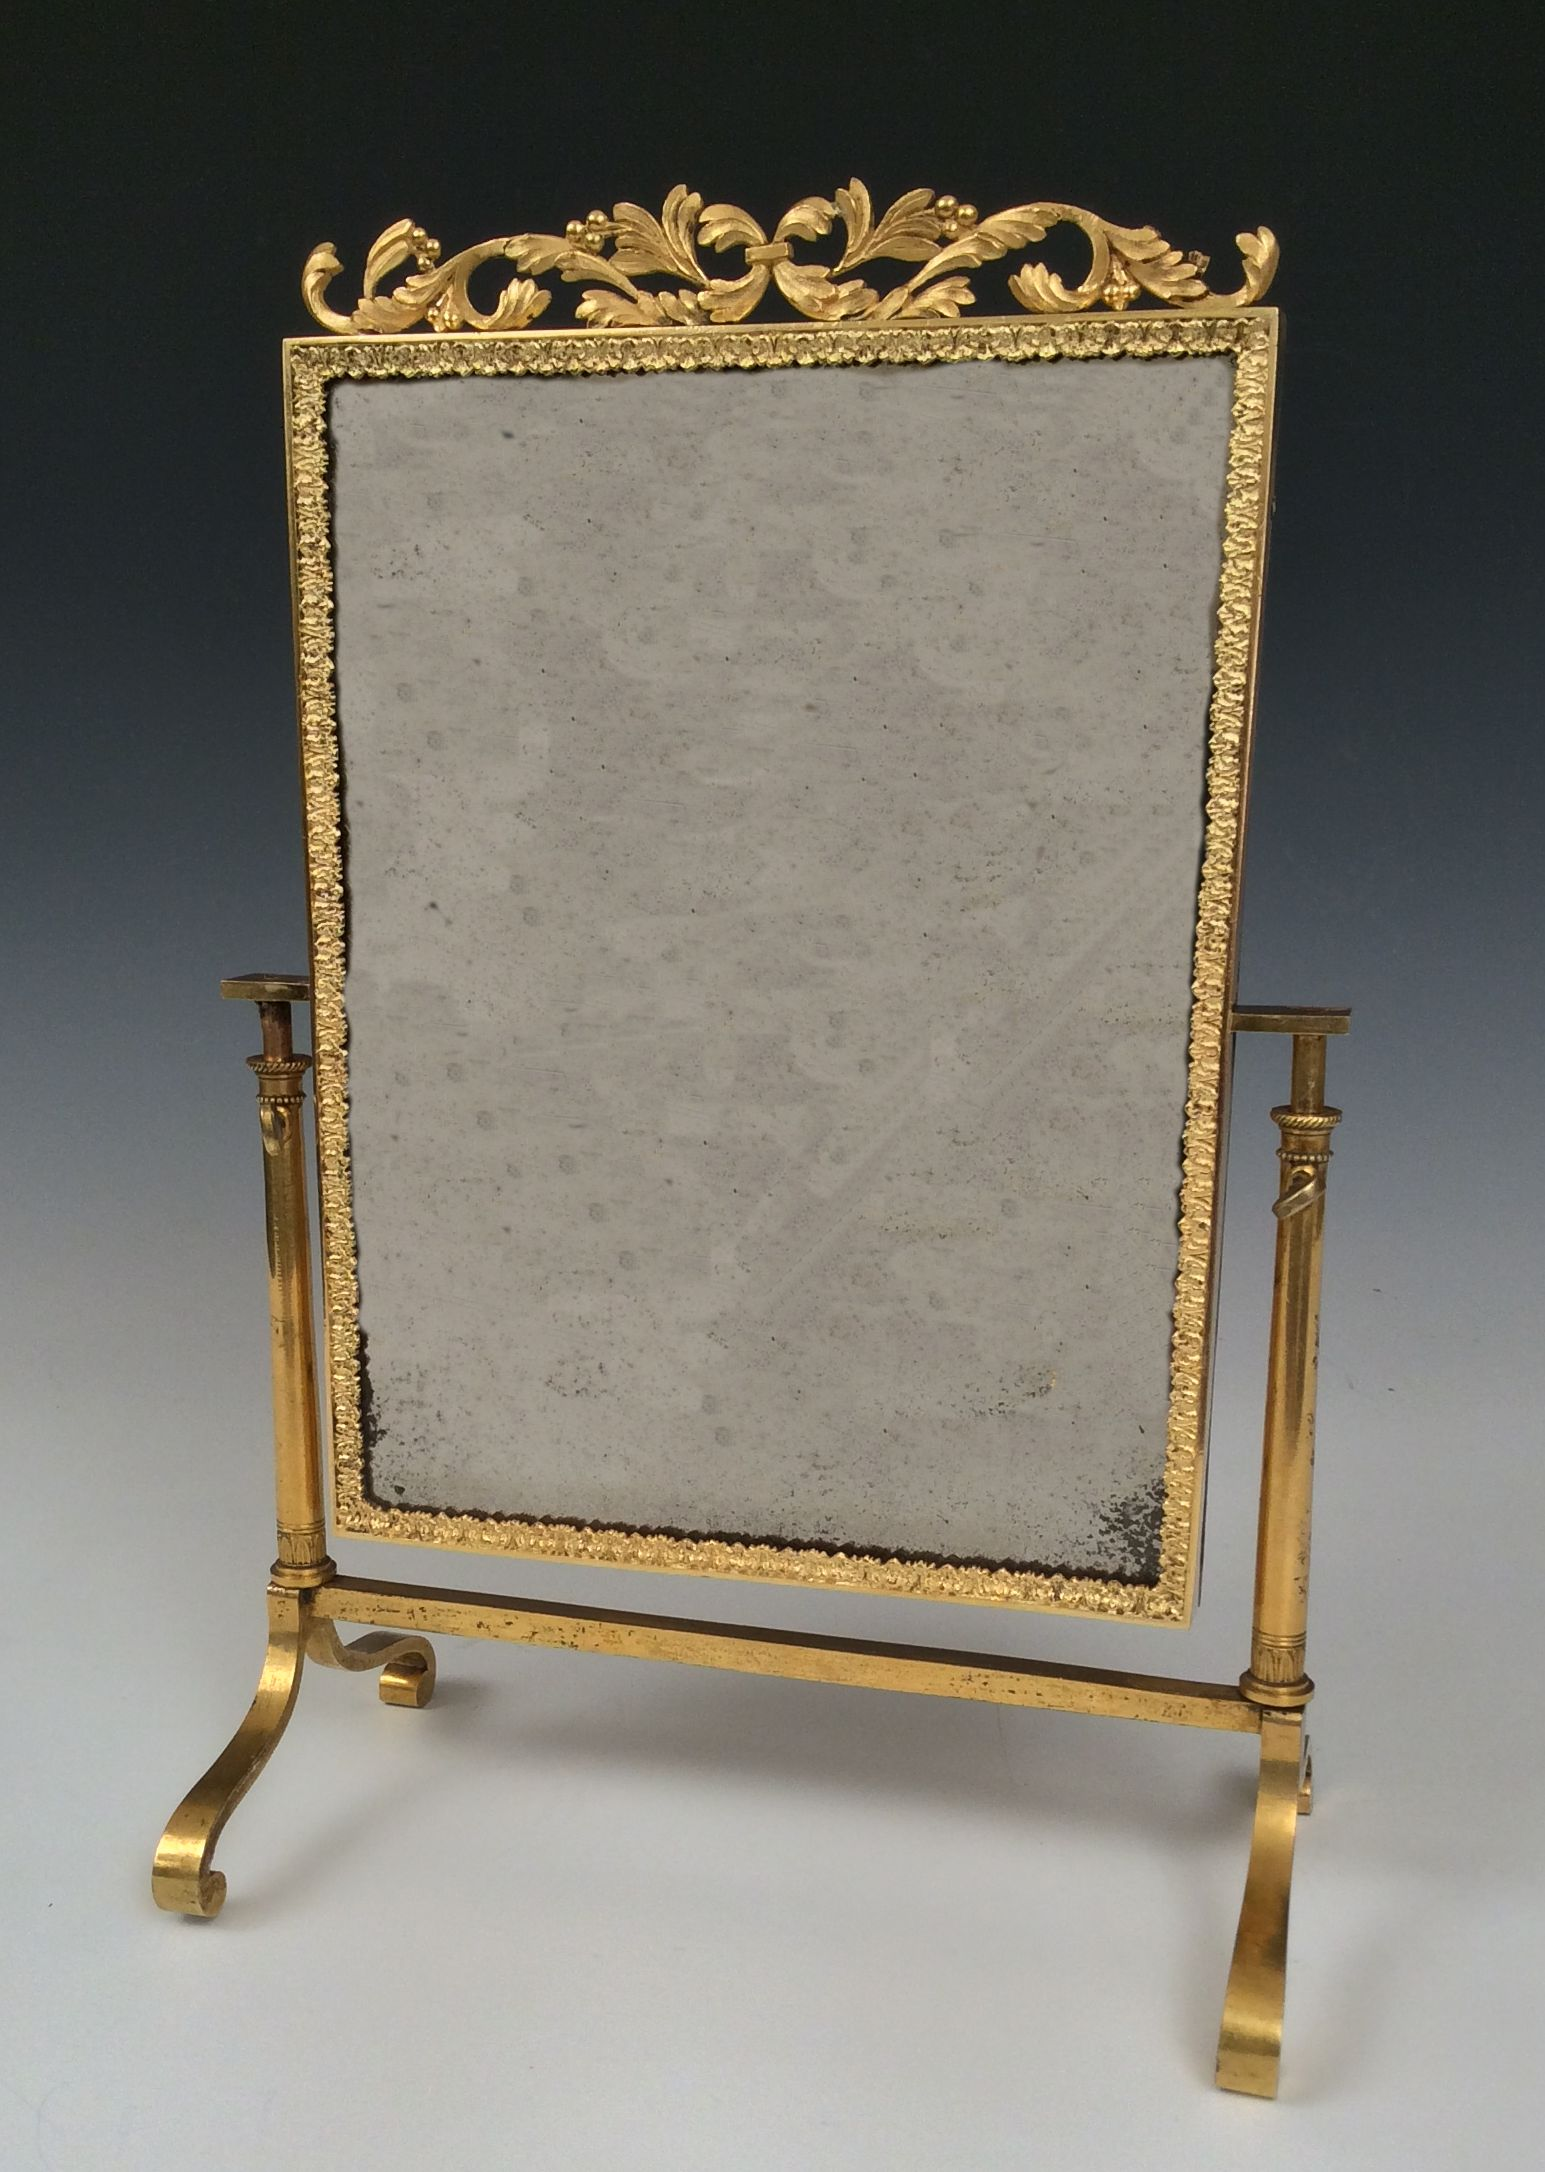 Antique mirrored dressing table - Antique Ormolu Gilt Bronze Viennese Miniature Dressing Table Mirror